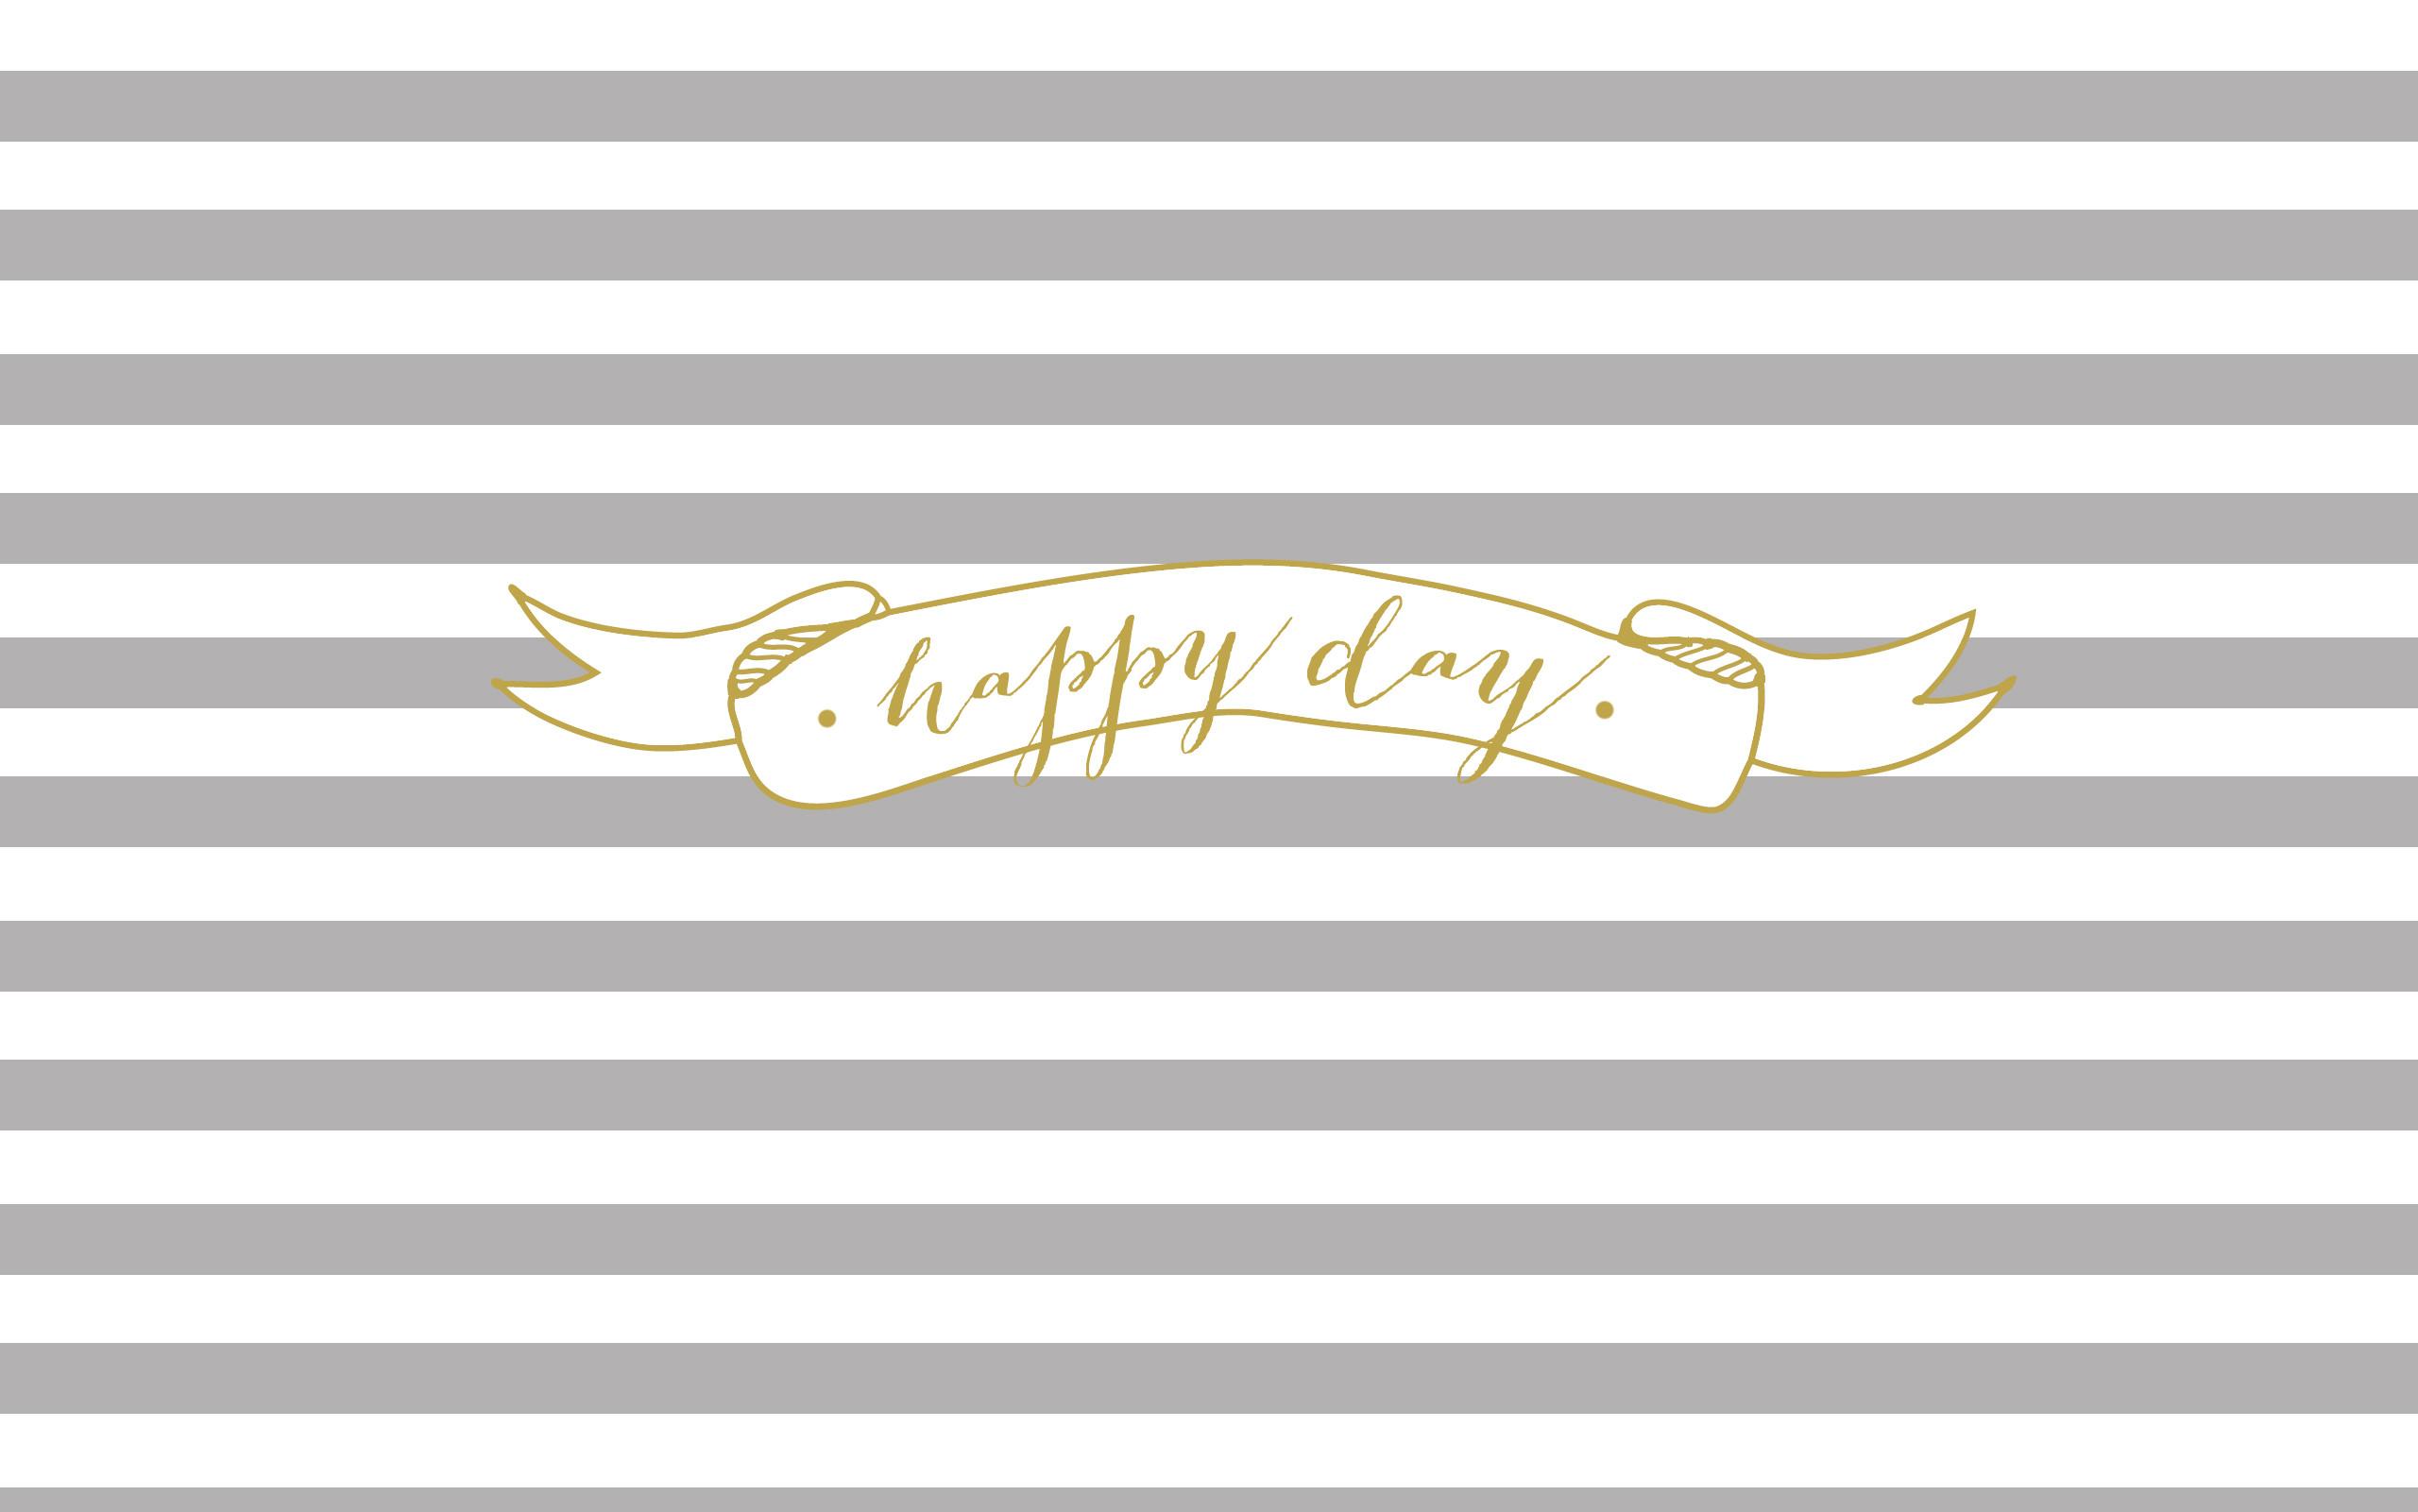 Coffee & Honeycomb: HAPPY DOWNLOAD / 2 | Happy Garden | Pinterest |  Honeycombs, Google search and Wallpaper